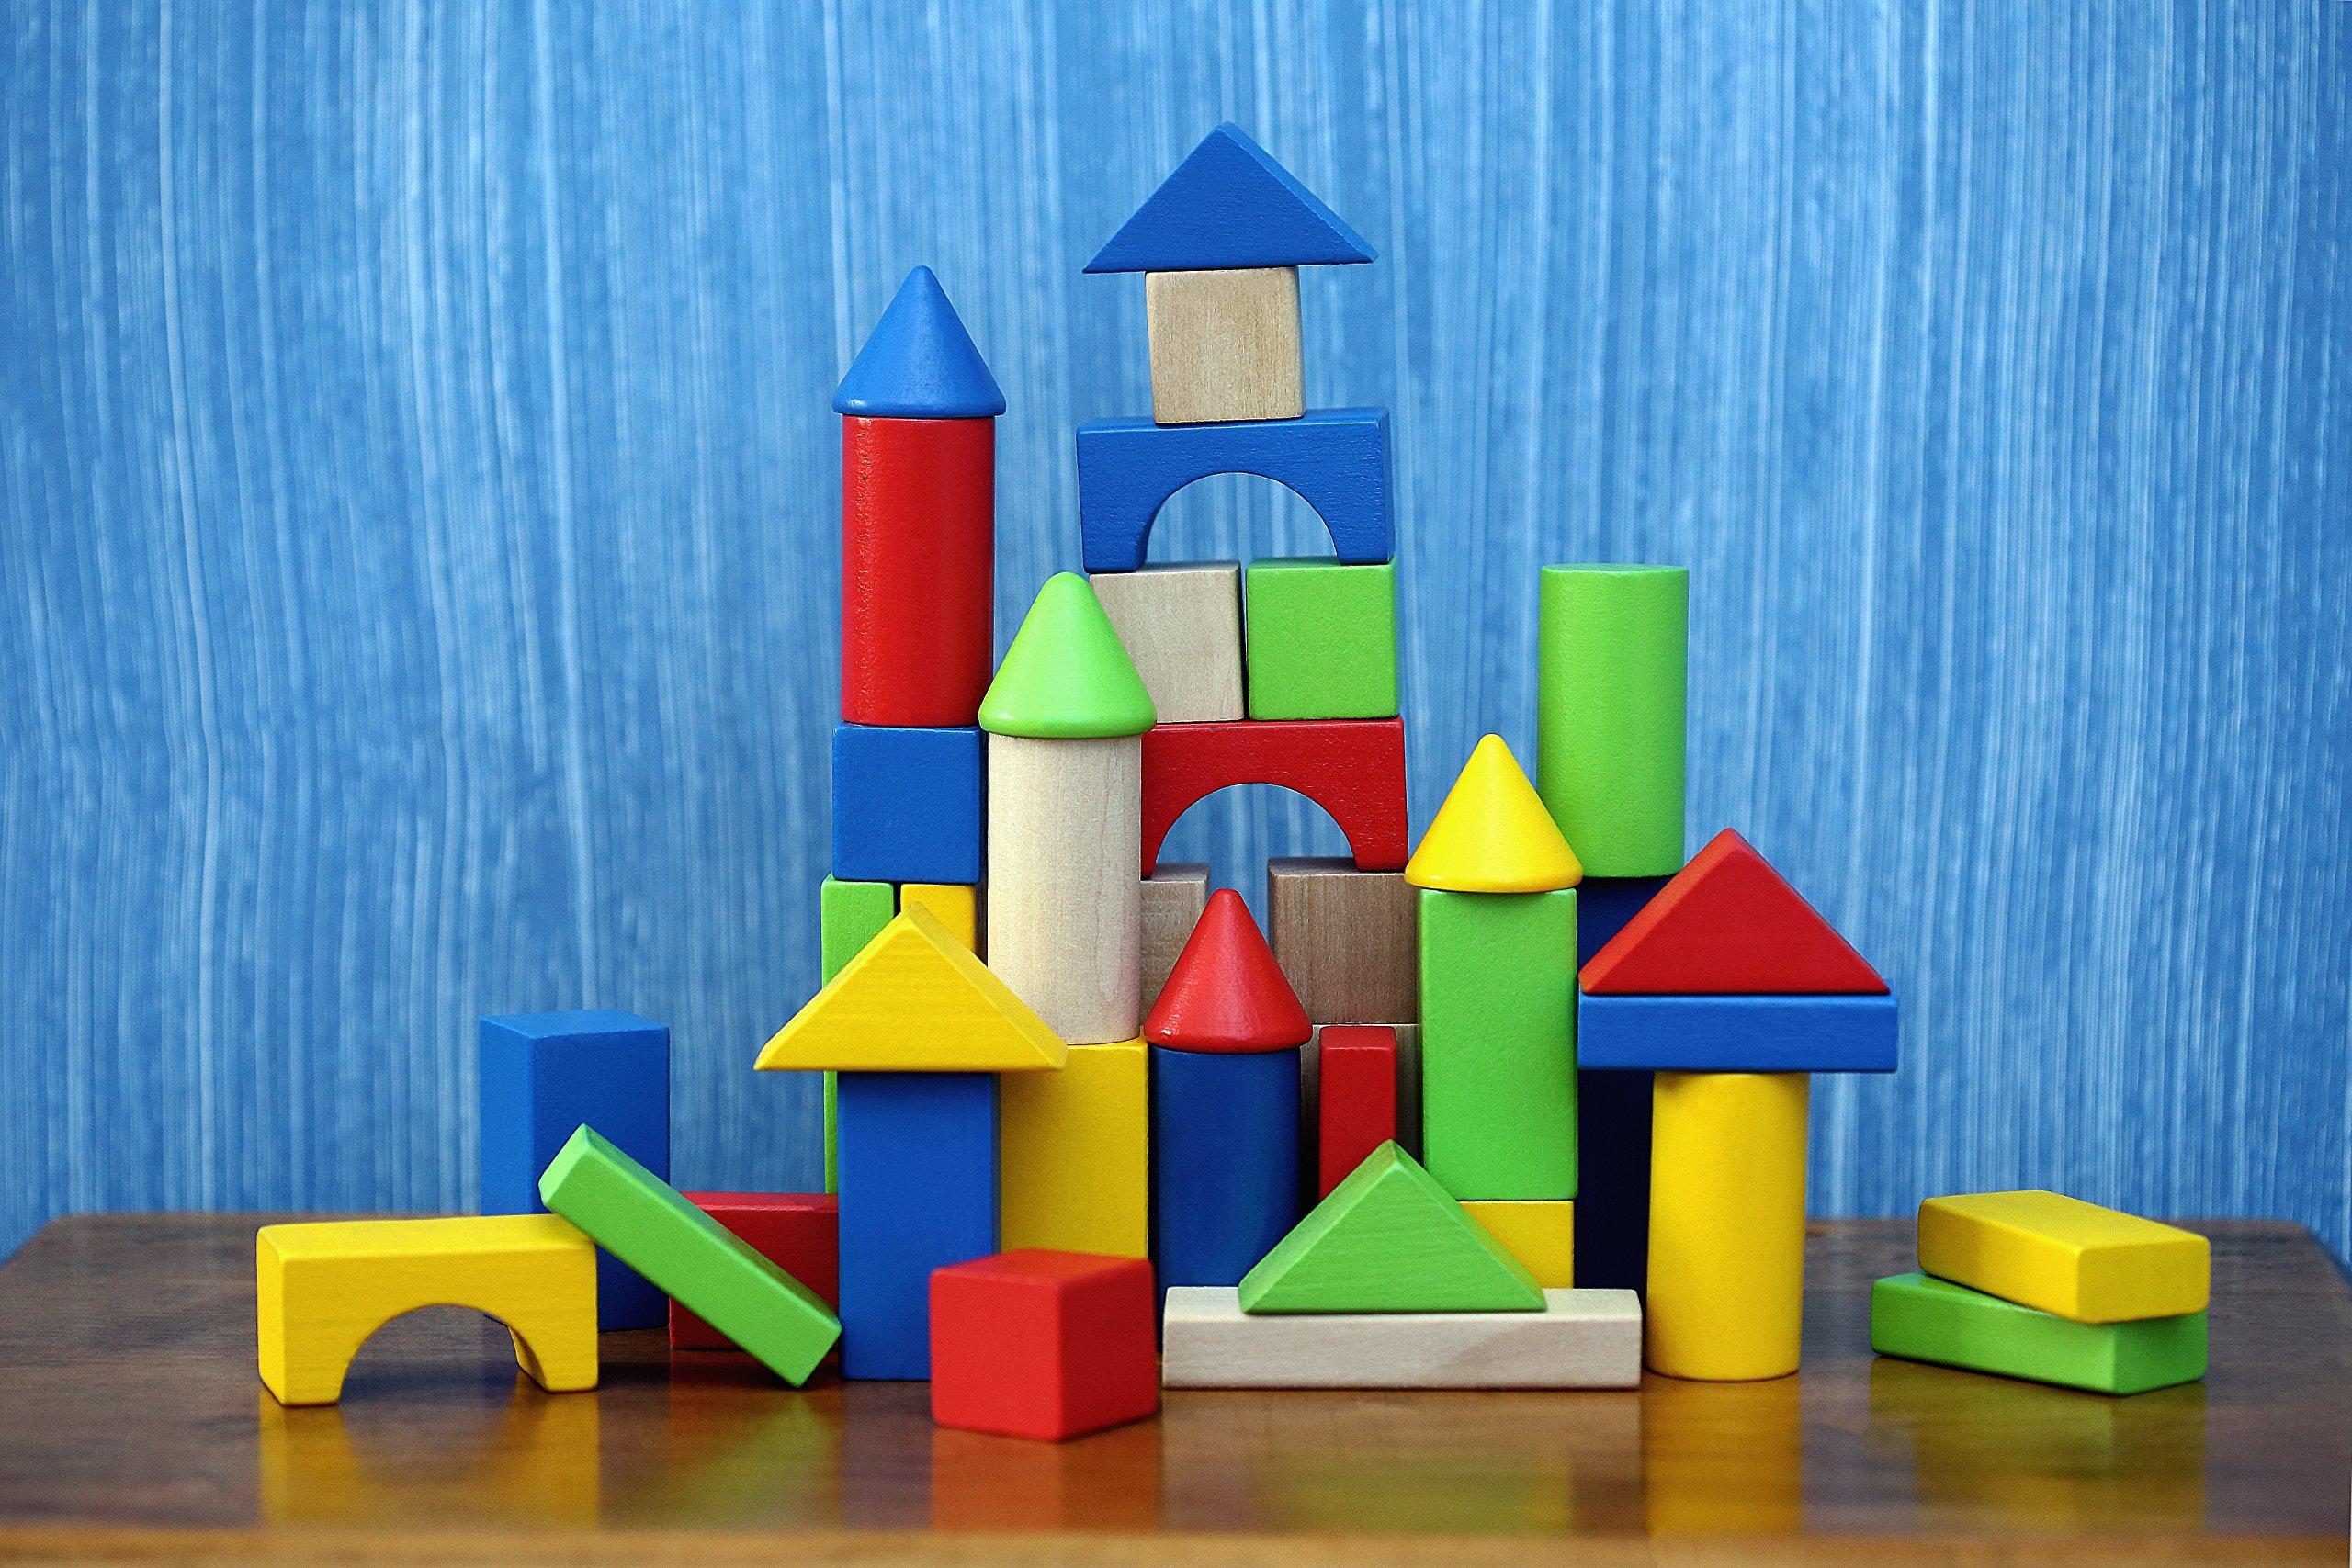 Delicieux Cubbie Lee 50 Pc Classic Wooden Building Blocks Set W/ Storage Bucket U2013 For  3